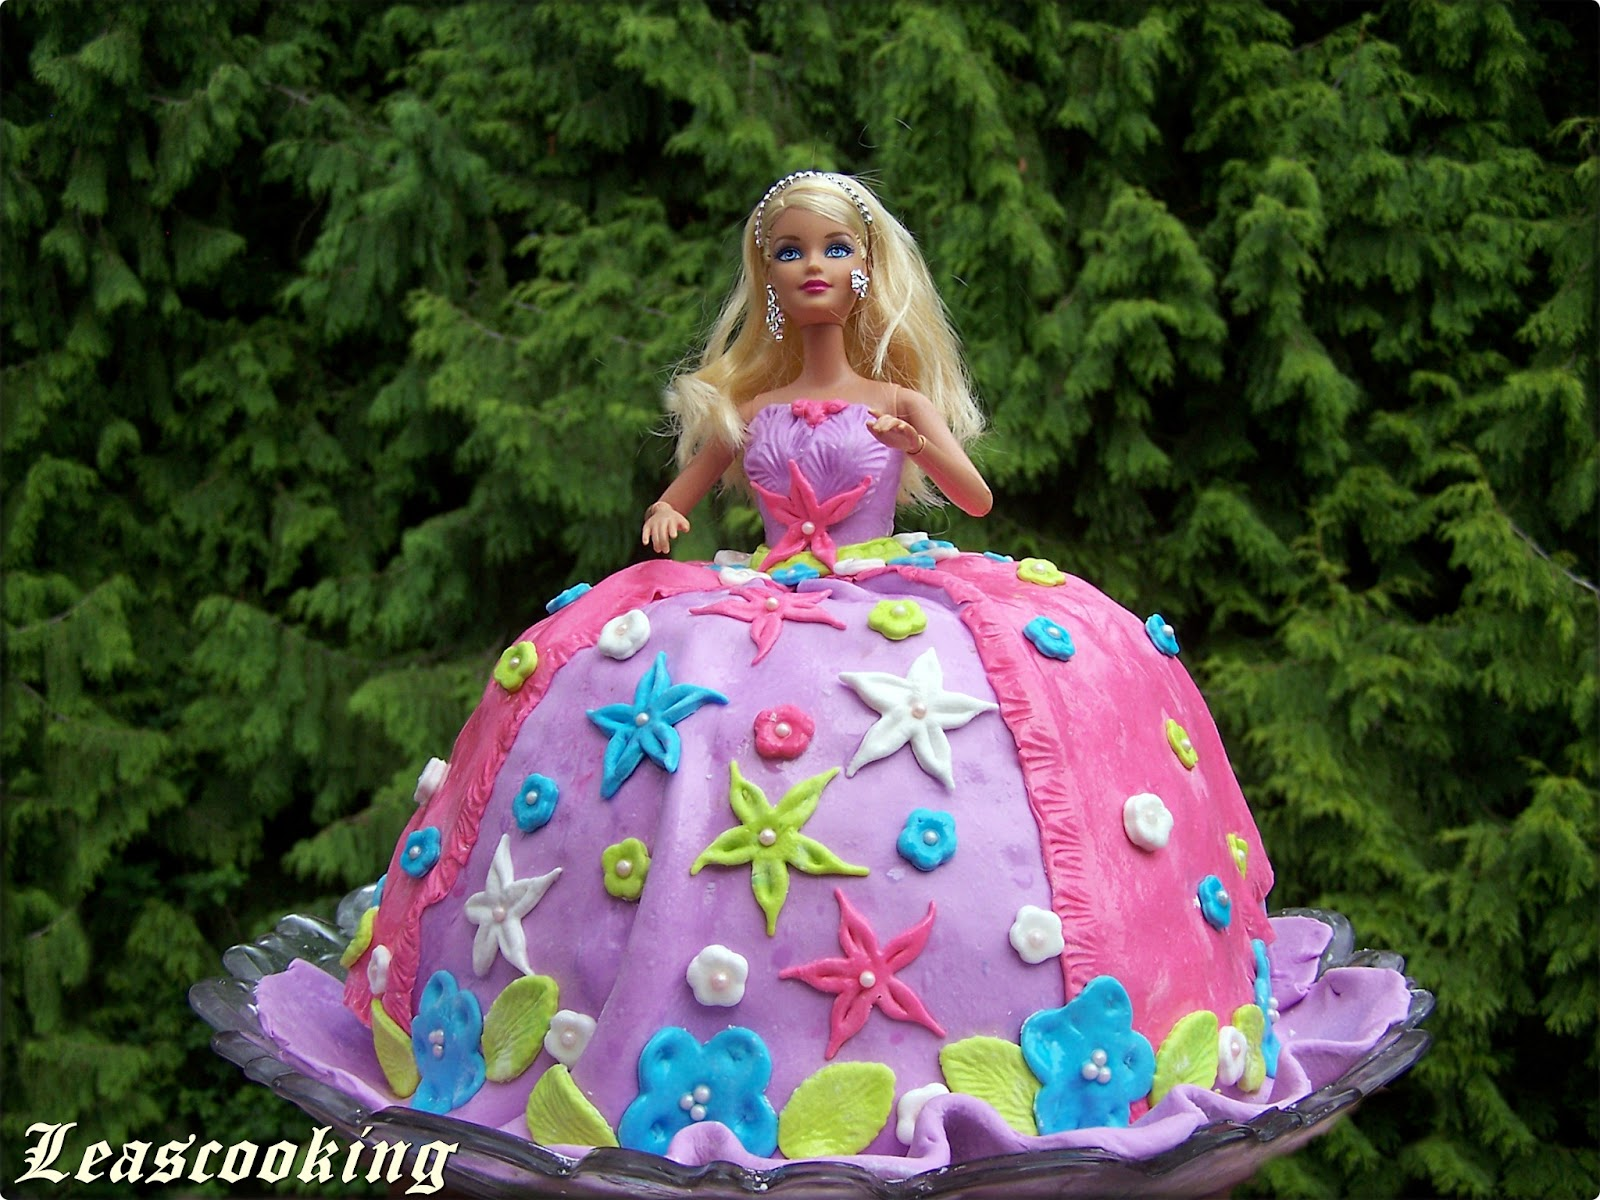 image She is my sugar baby love